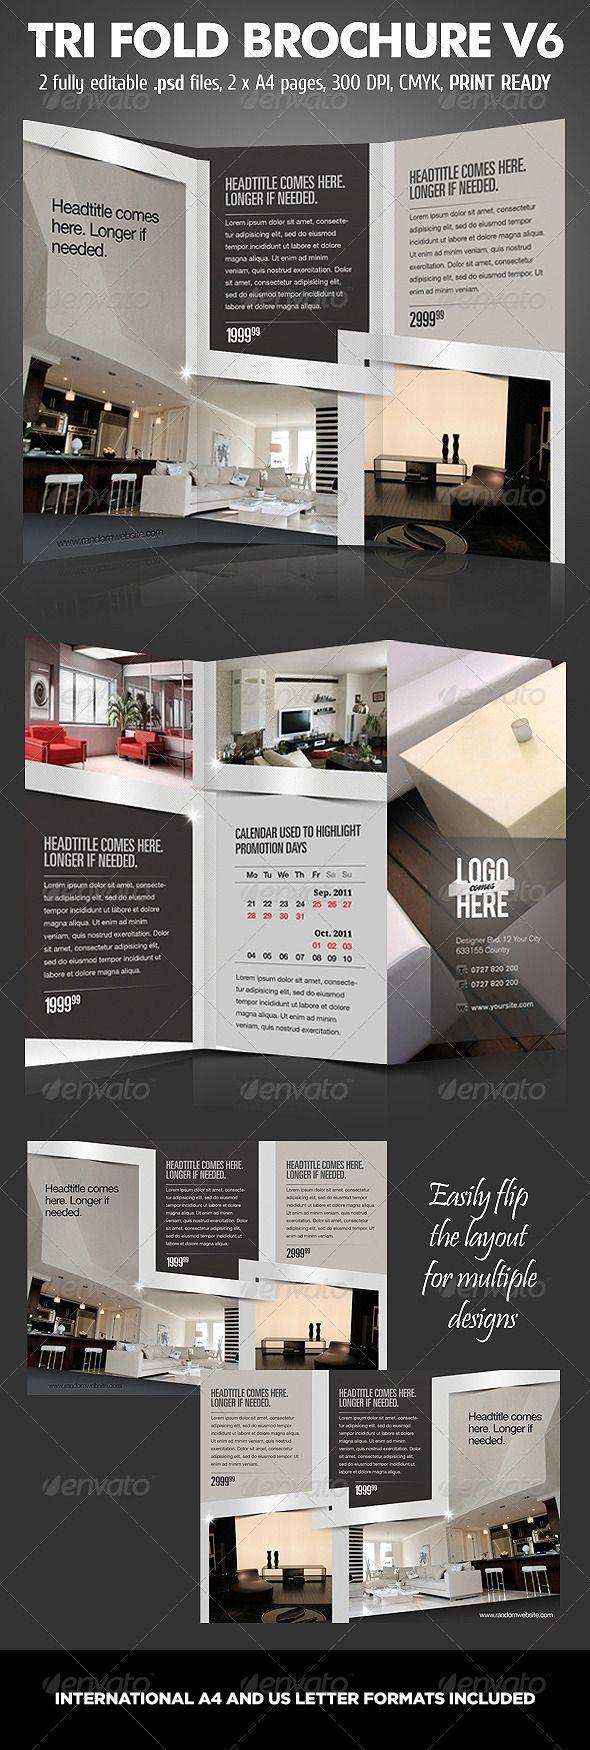 interior design brochure - trifold brochure v6 brochures and tri fold brochure design